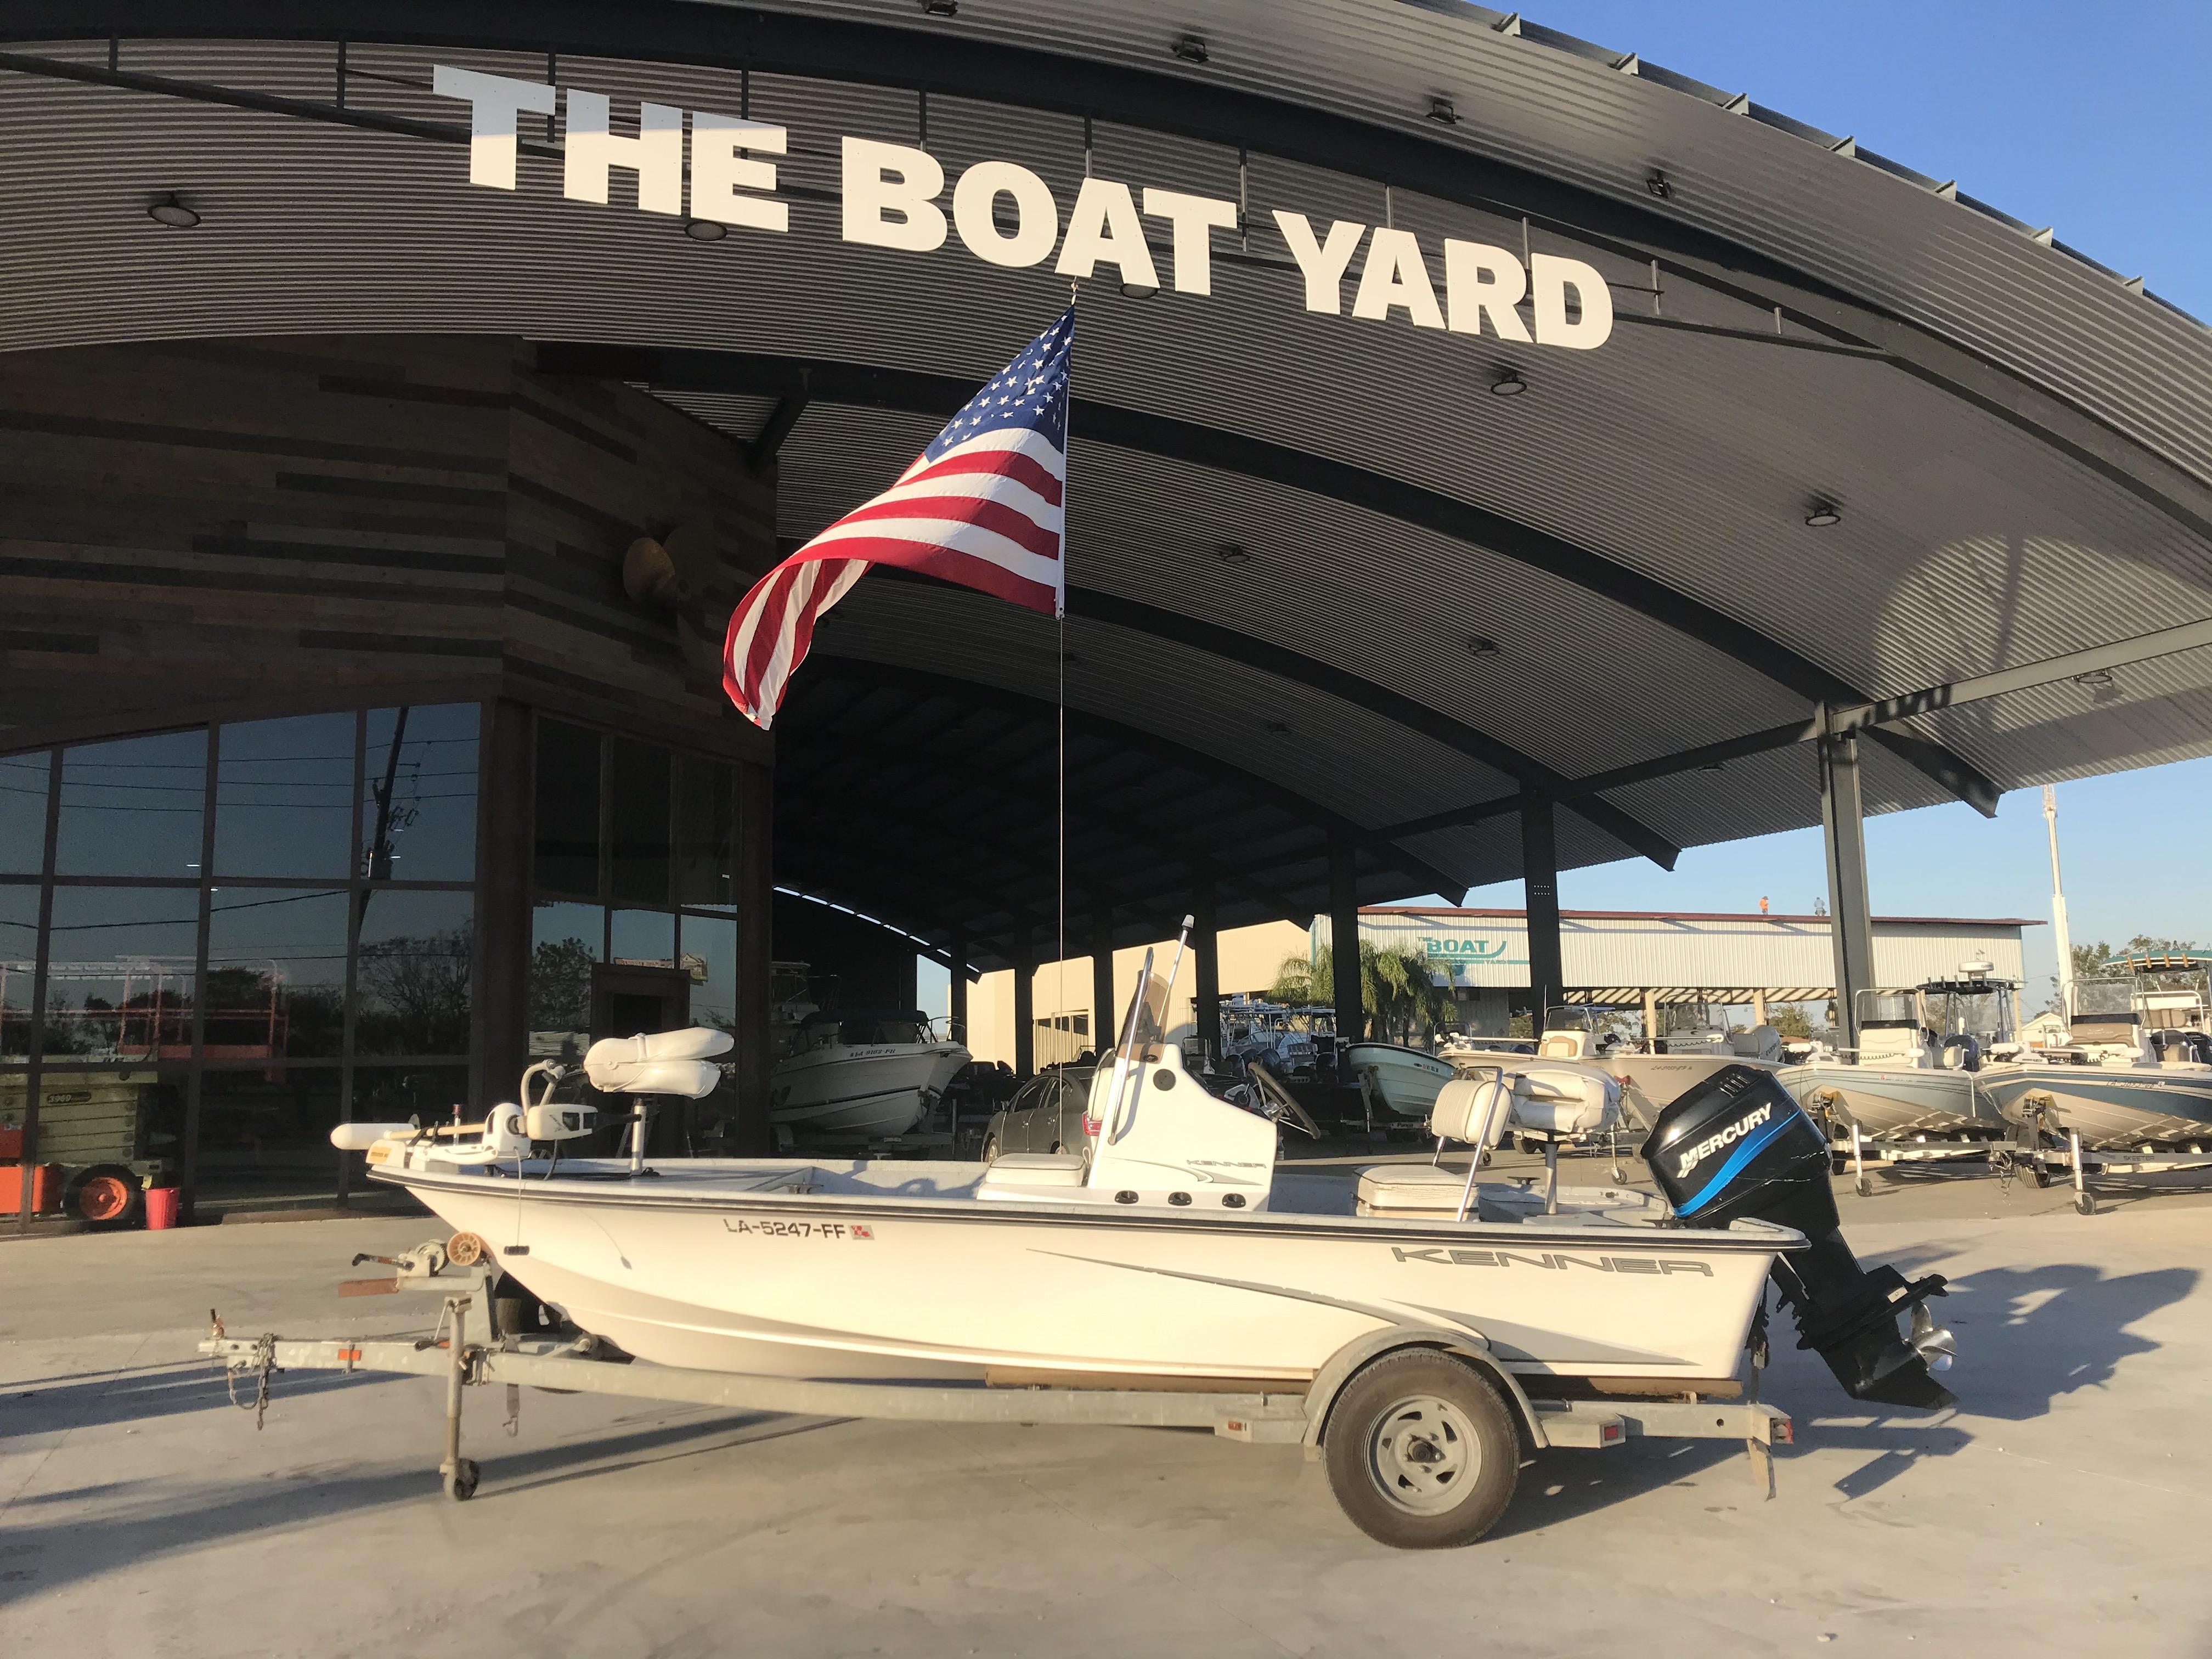 2002 Kenner boat for sale, model of the boat is 180V & Image # 1 of 10